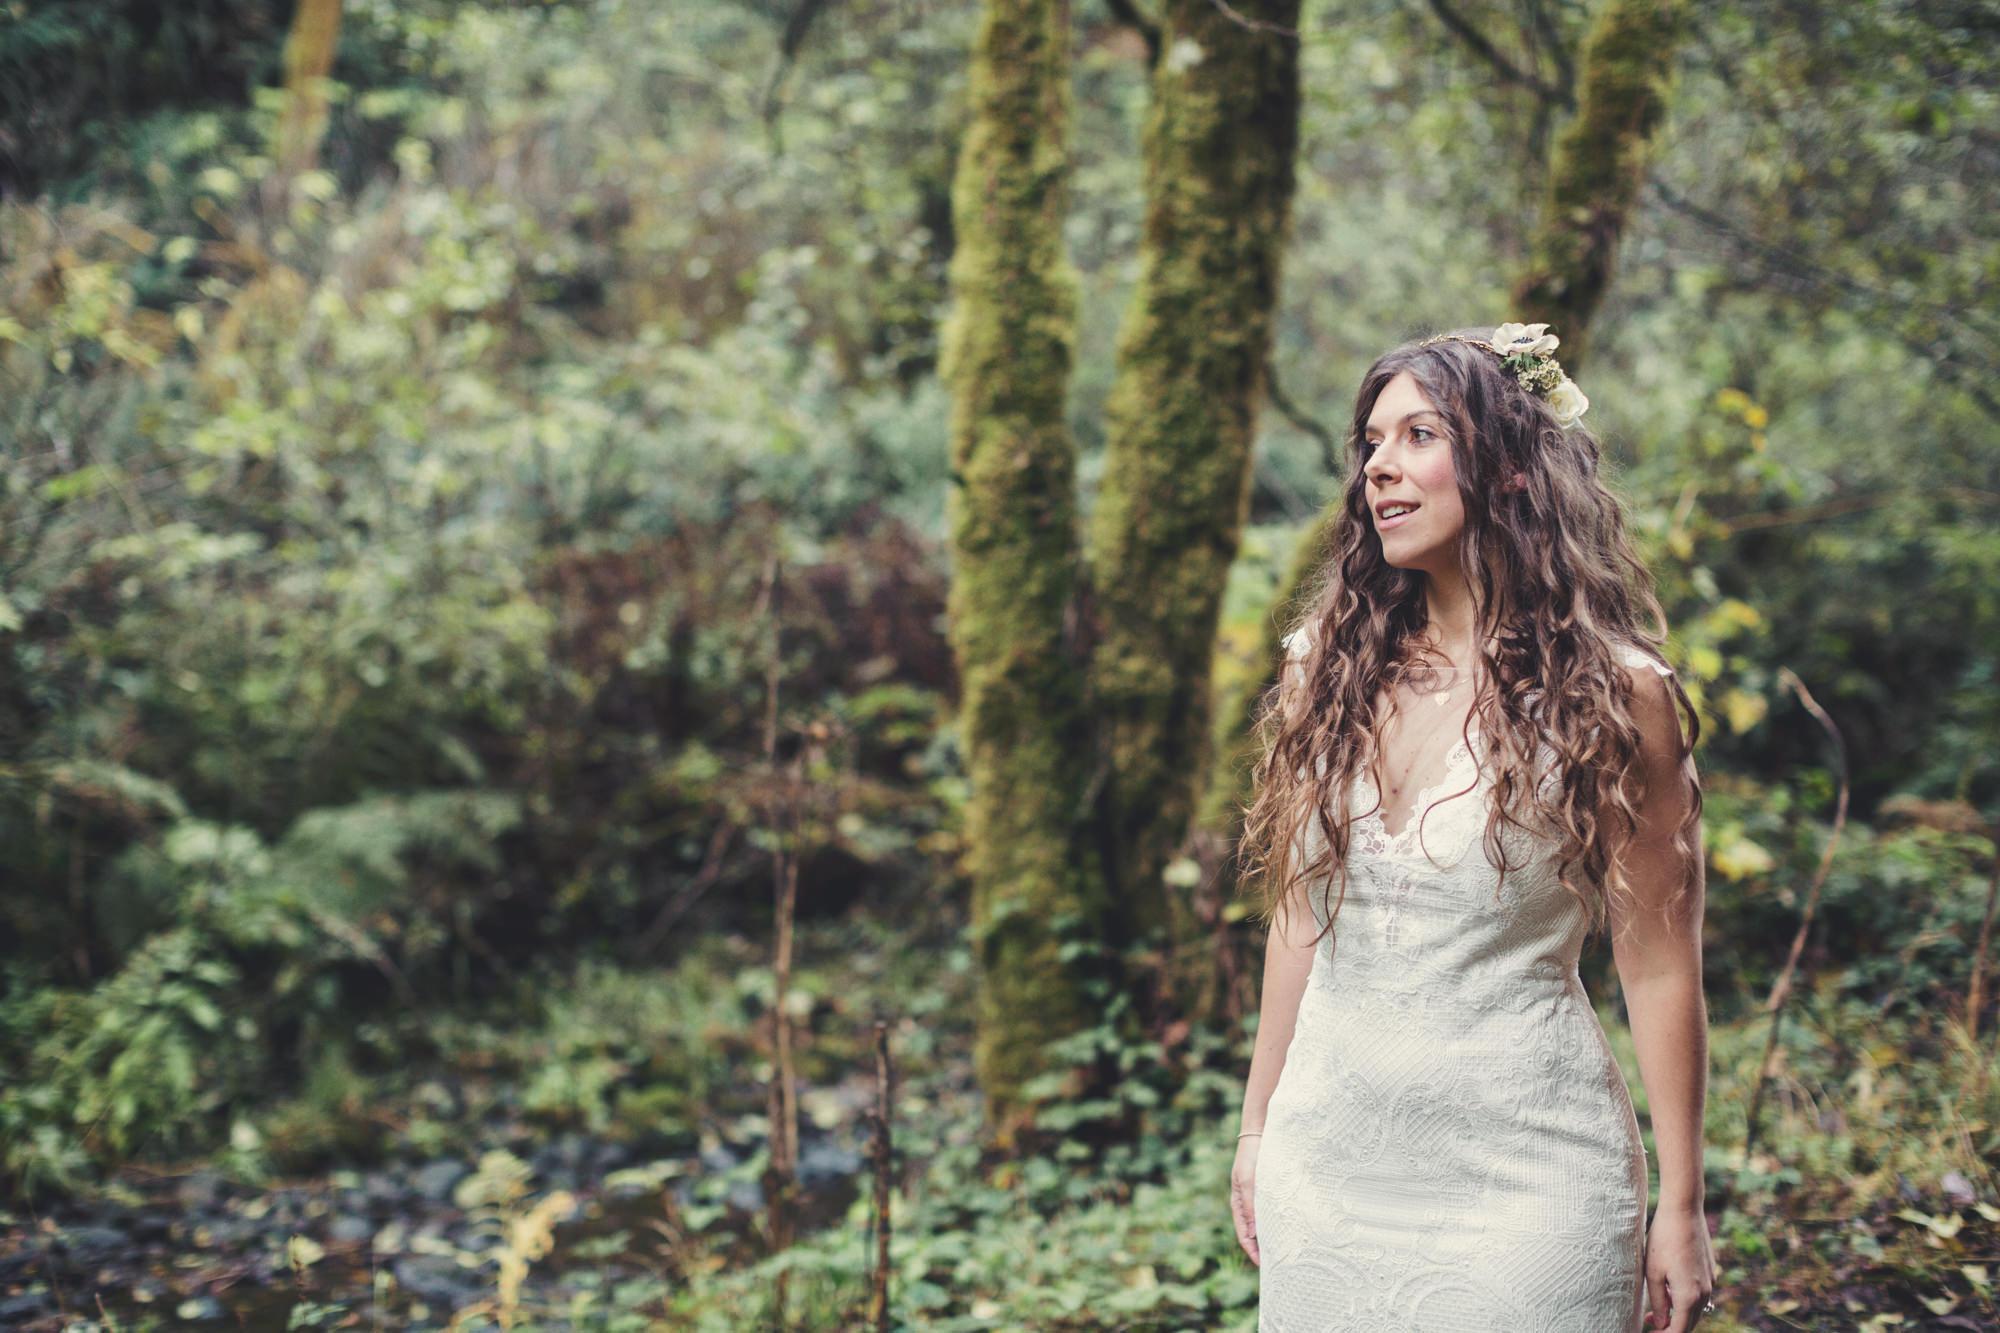 Little River Inn Wedding@Anne-Claire Brun 51